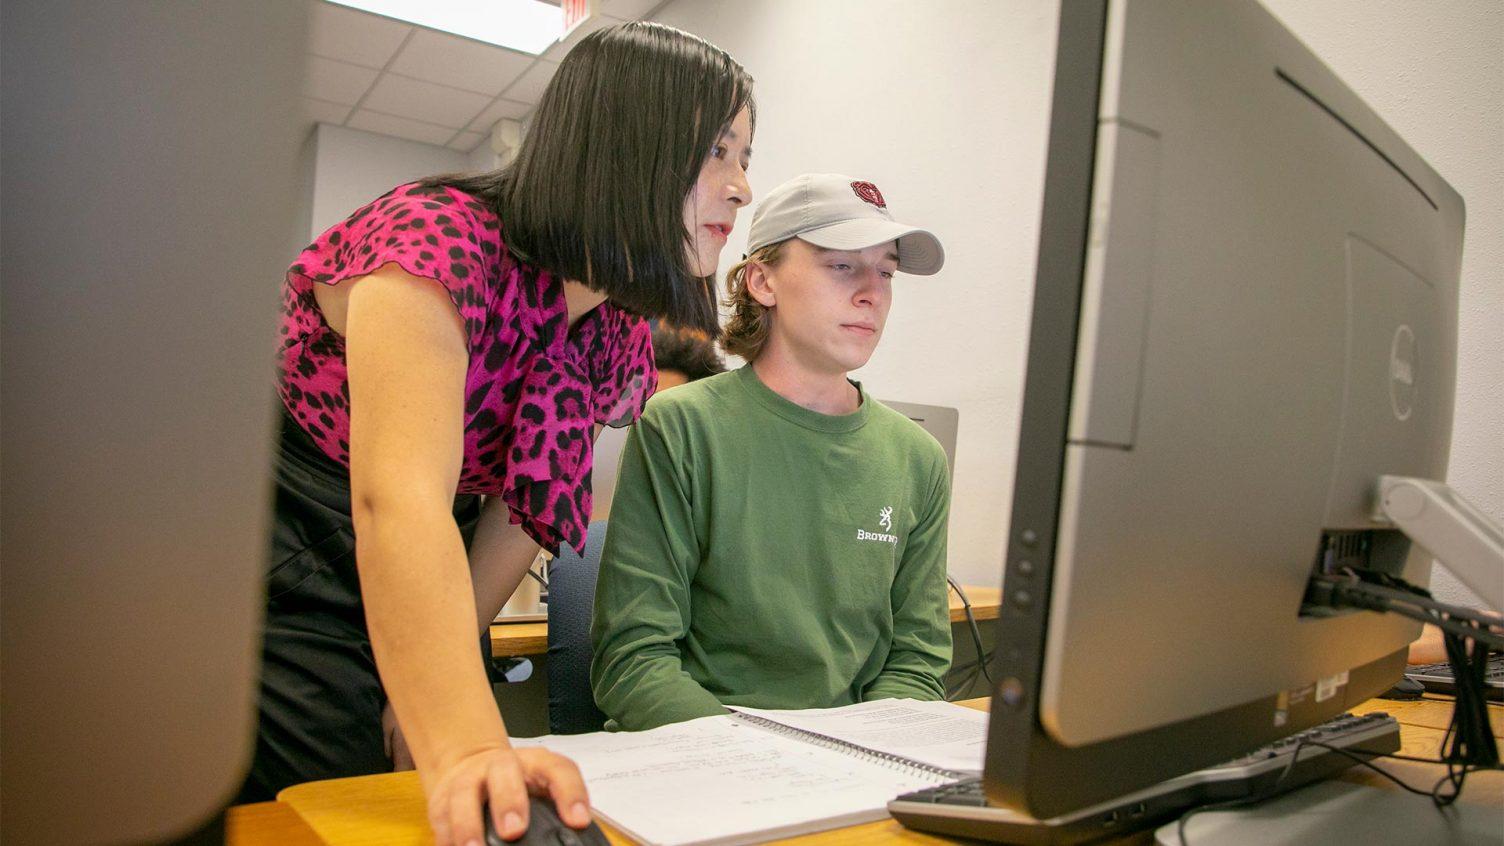 Dr. Liu helping a student